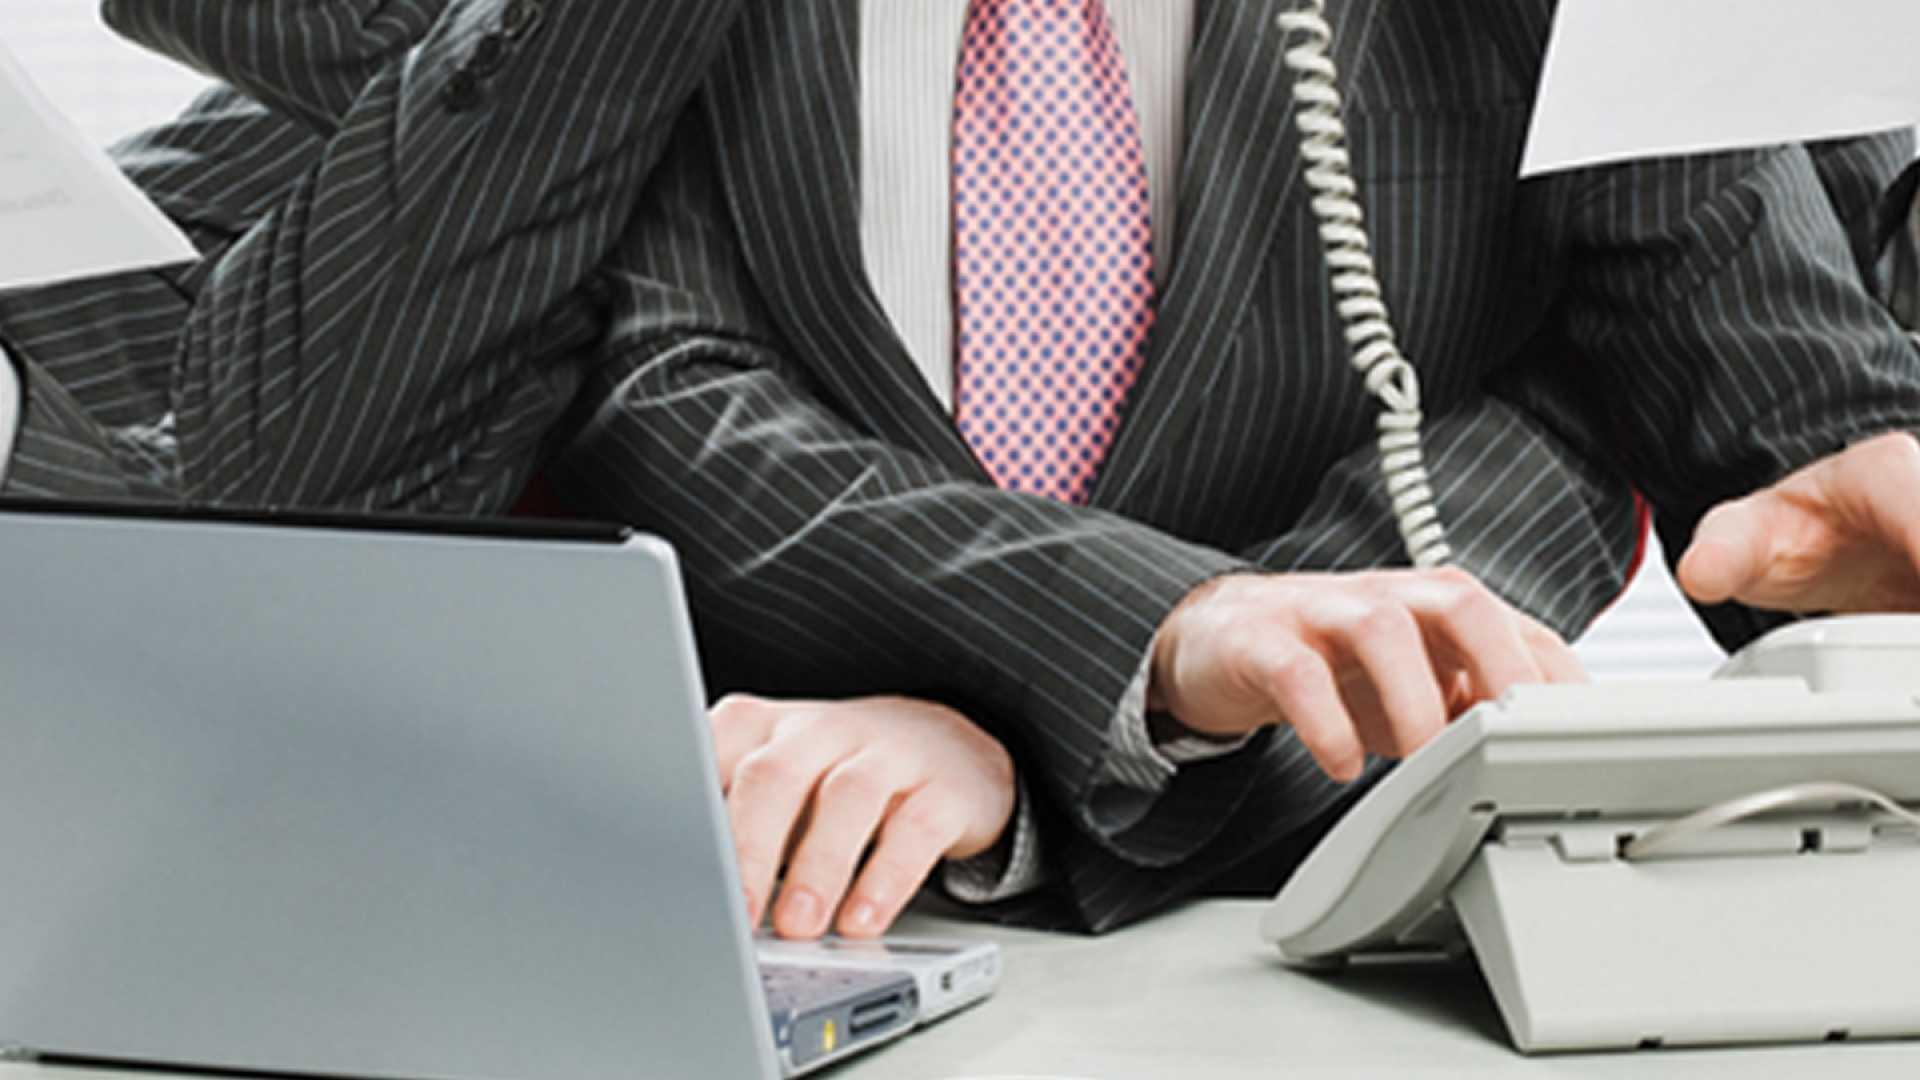 Is Multitasking Harmful? Maybe Not